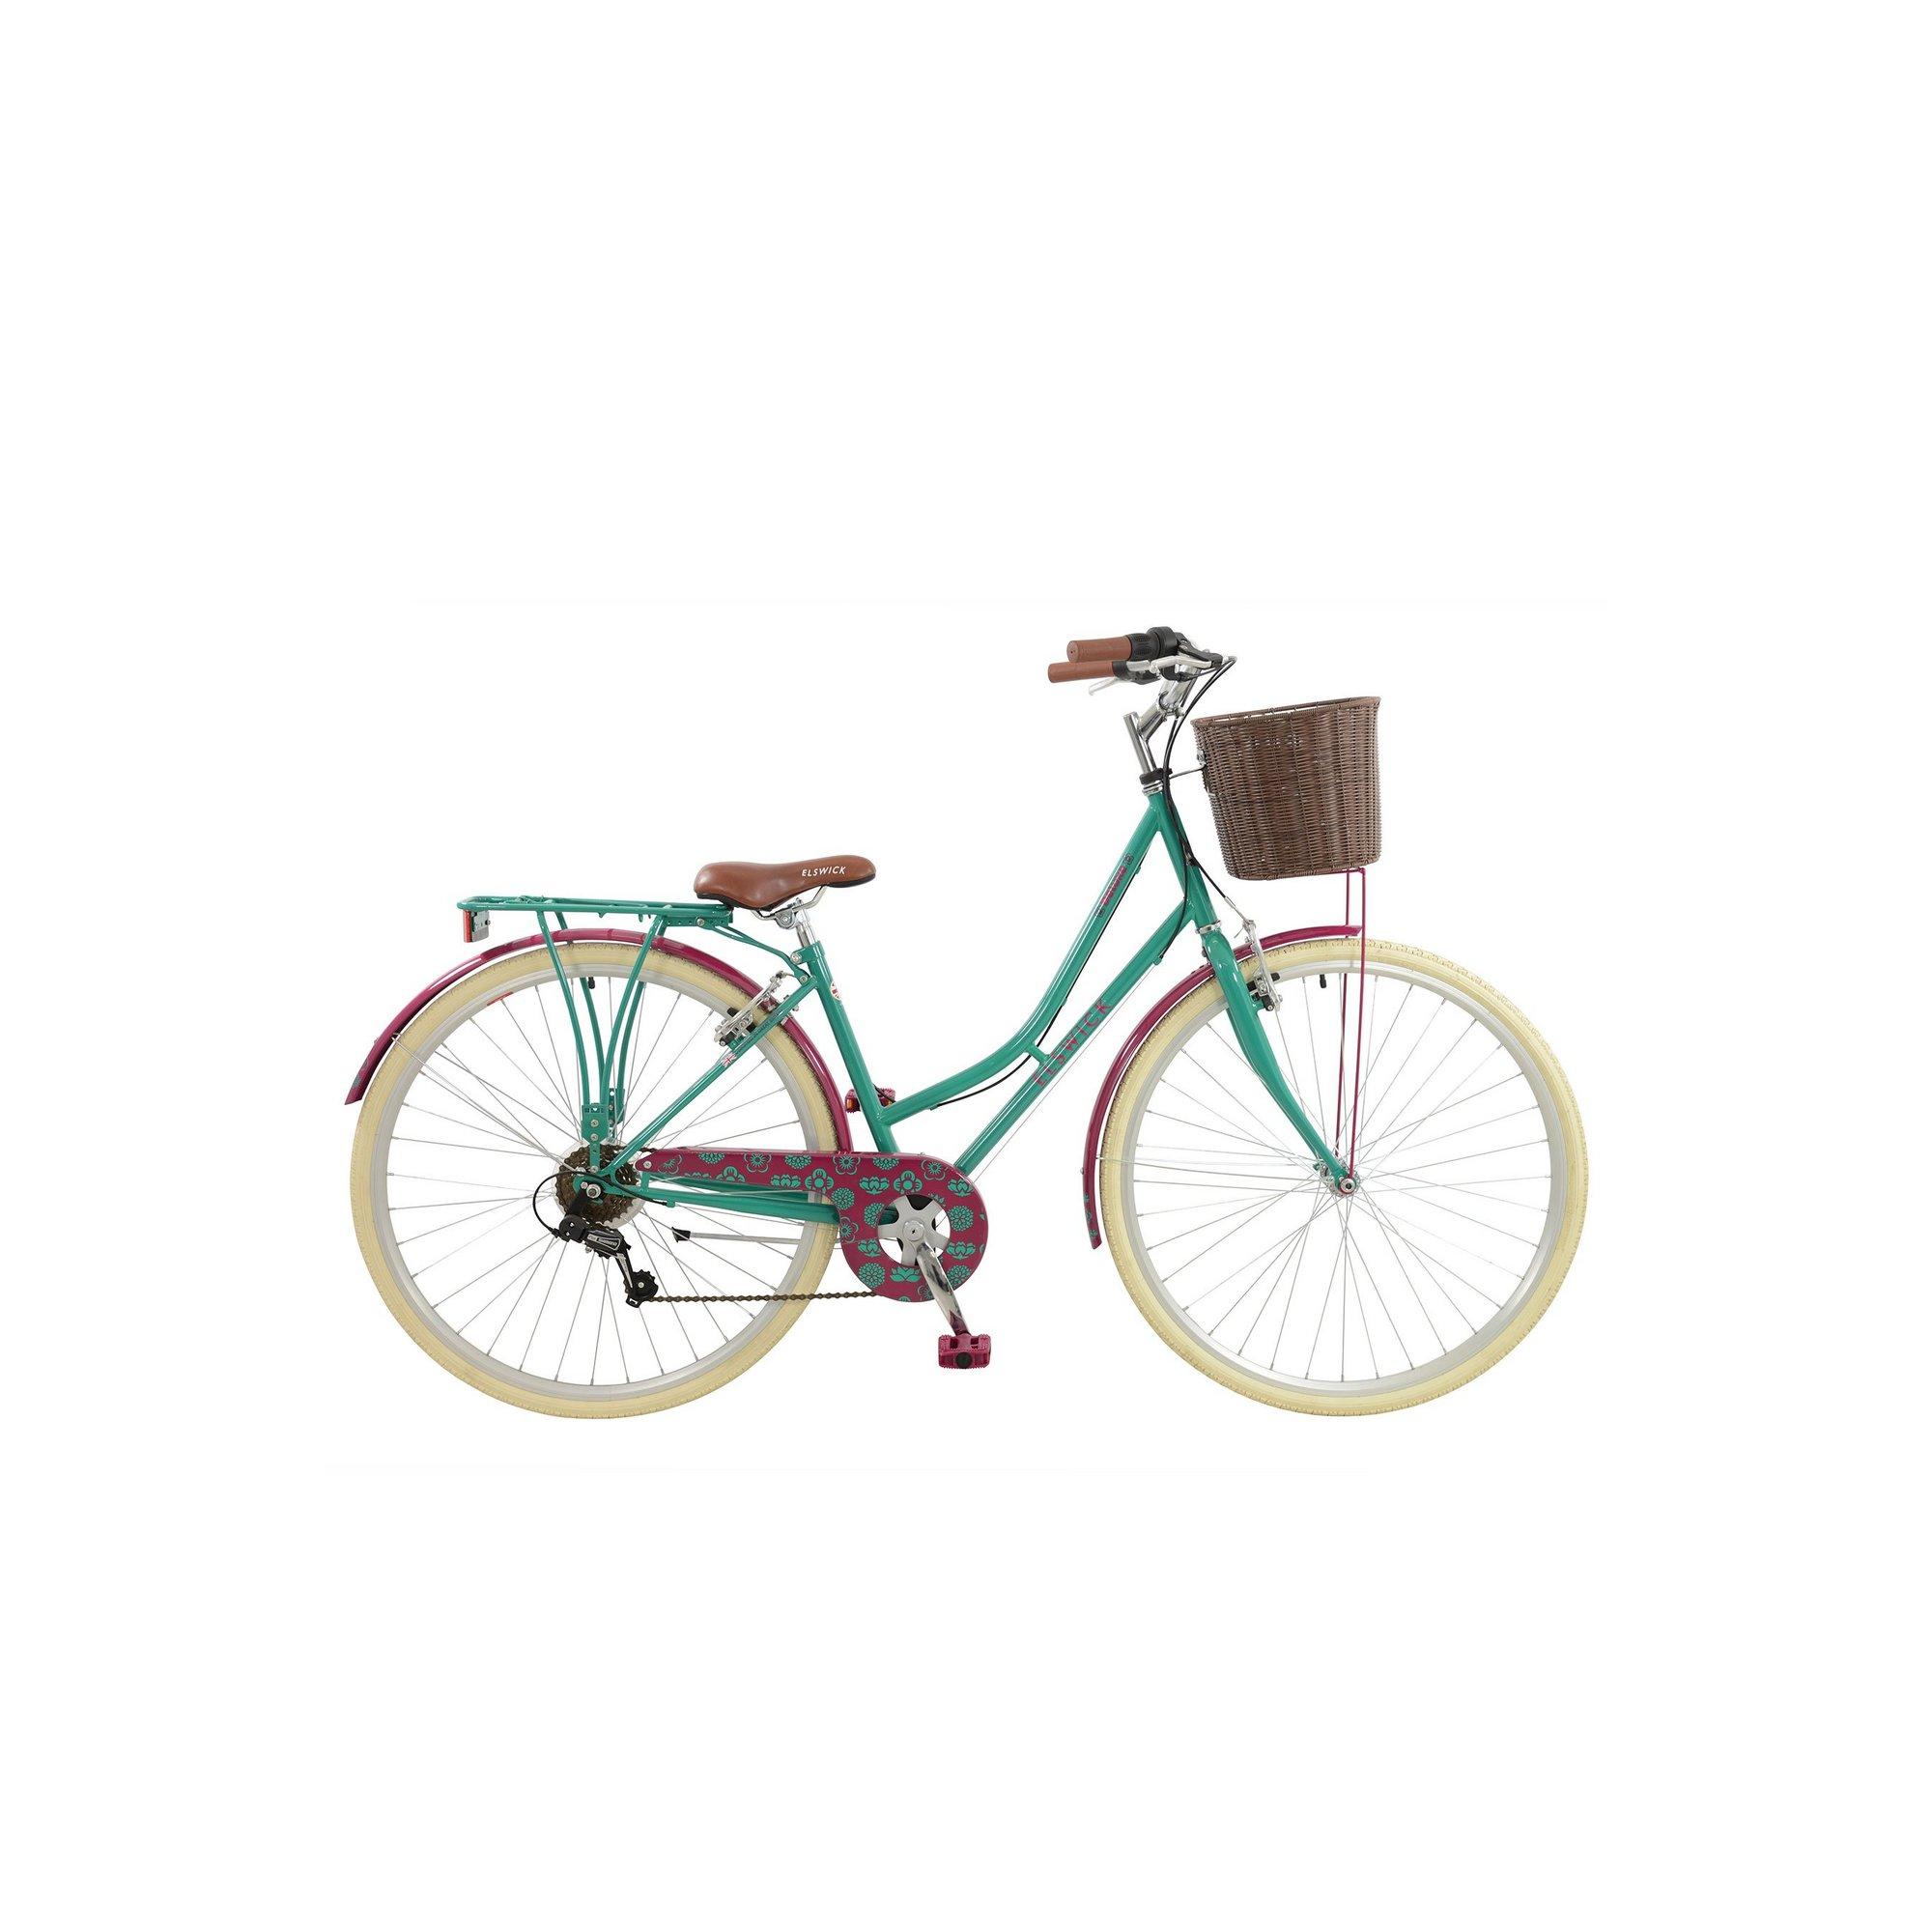 Image of Elswick 17 Inch Deluxe Bike